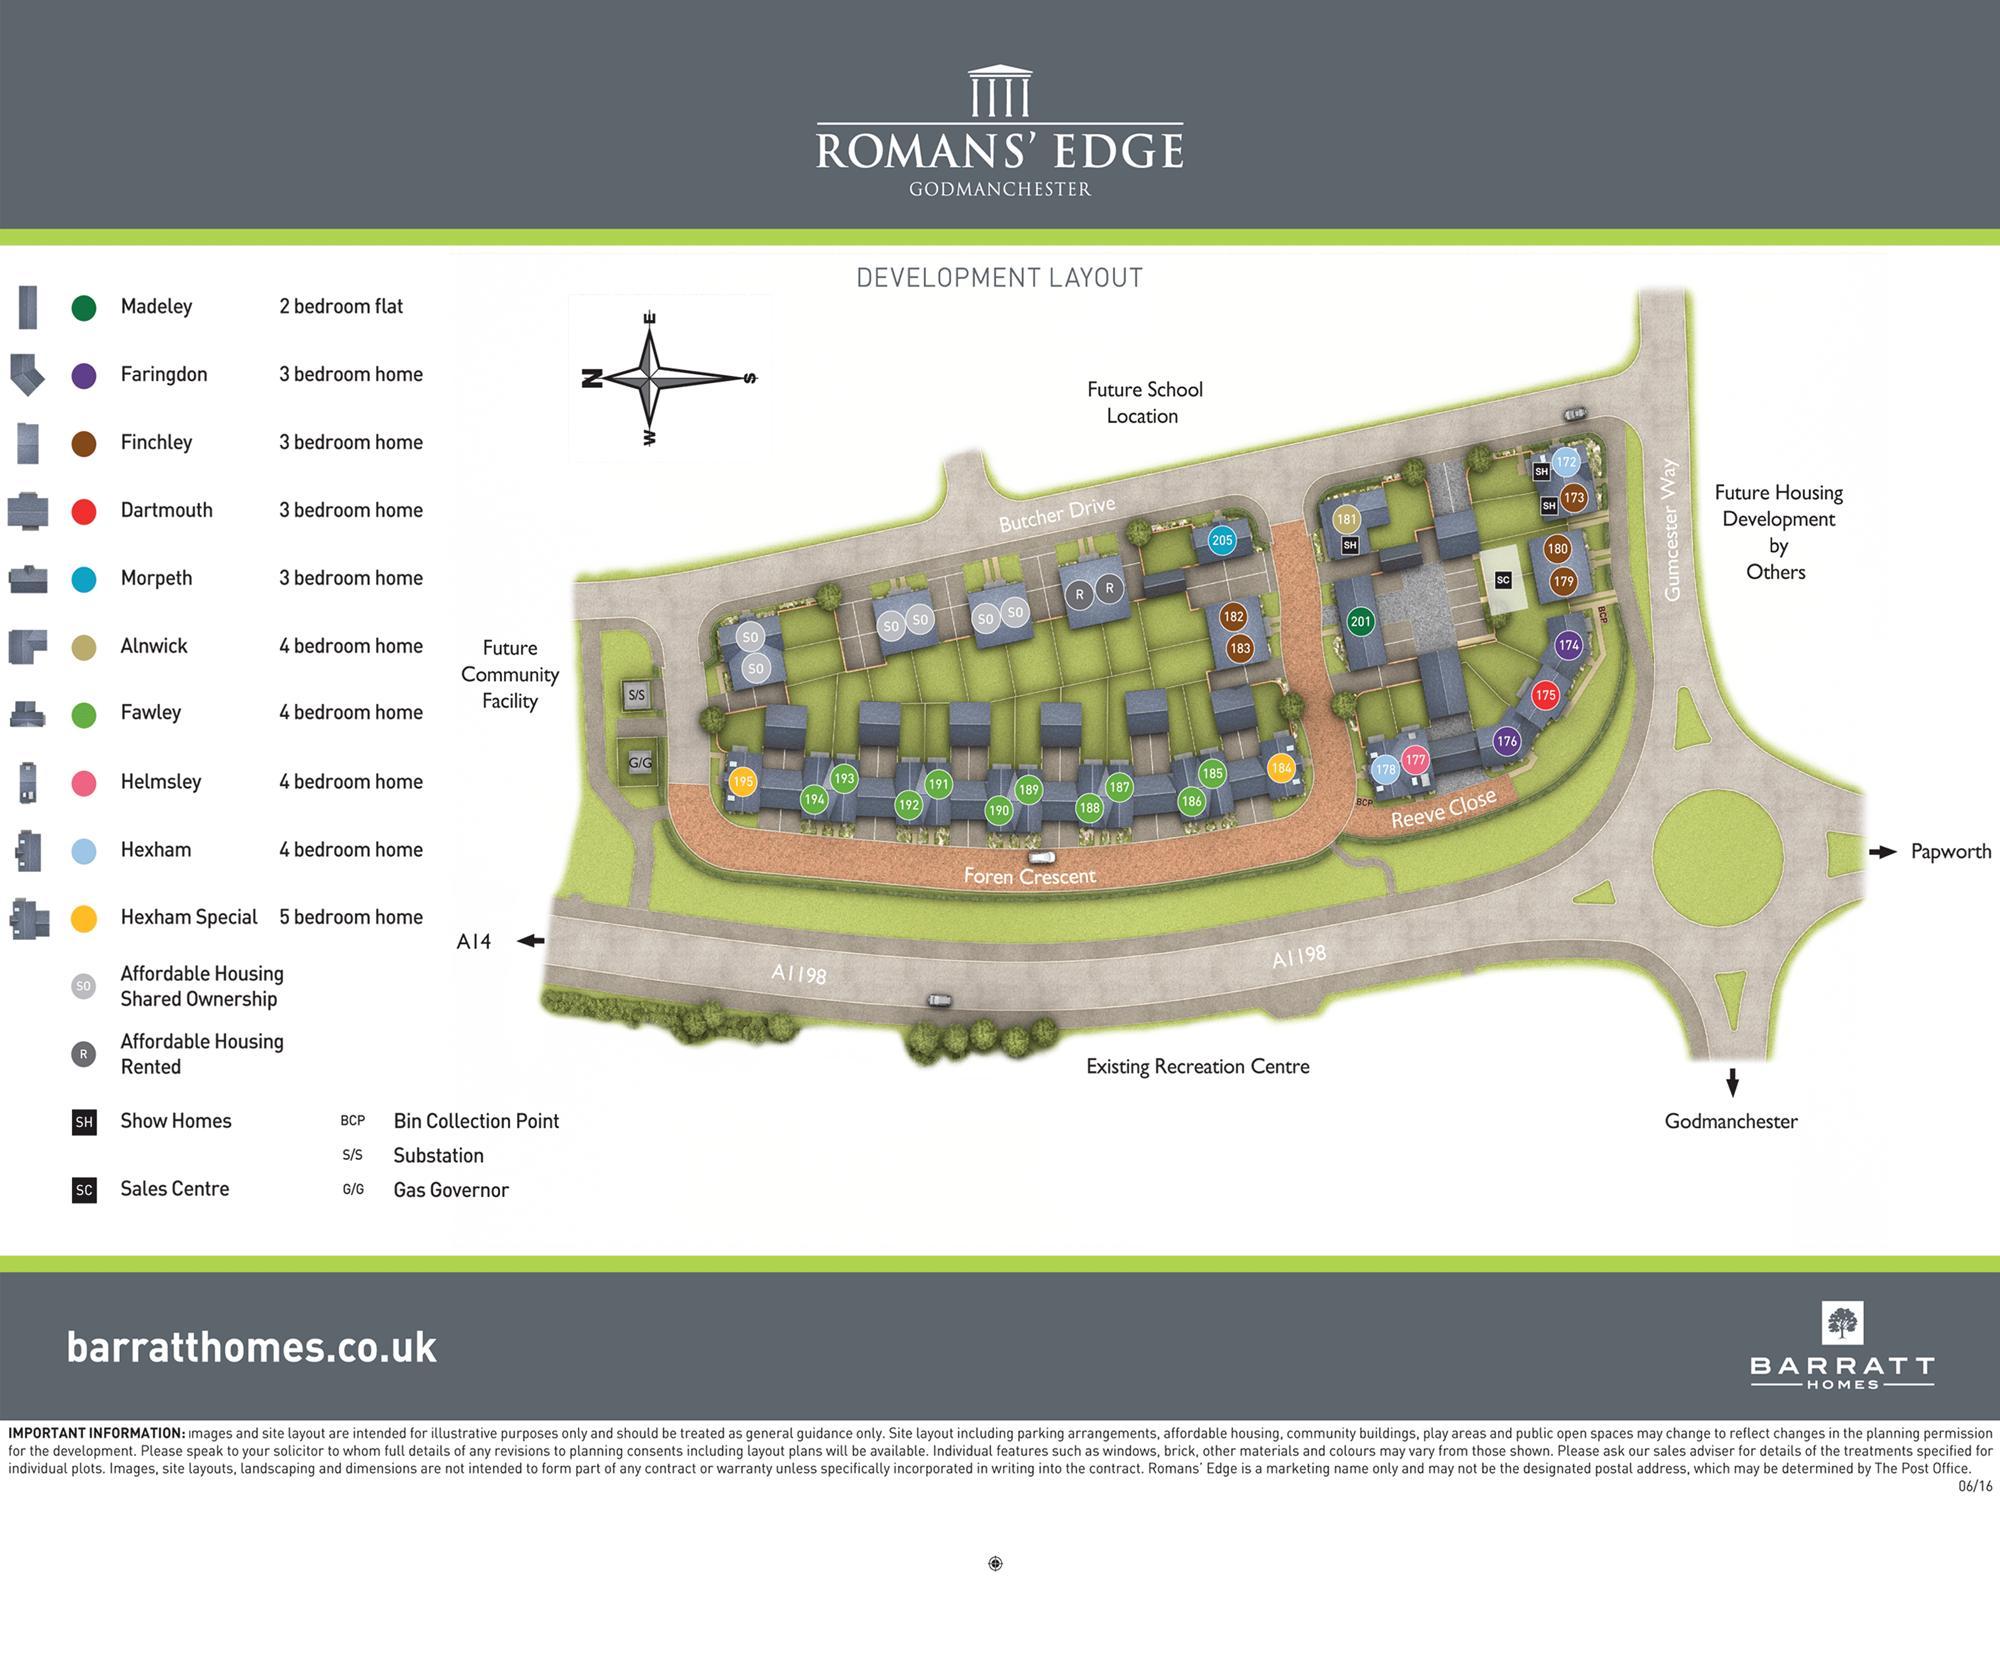 Romans%27 Edge development plan